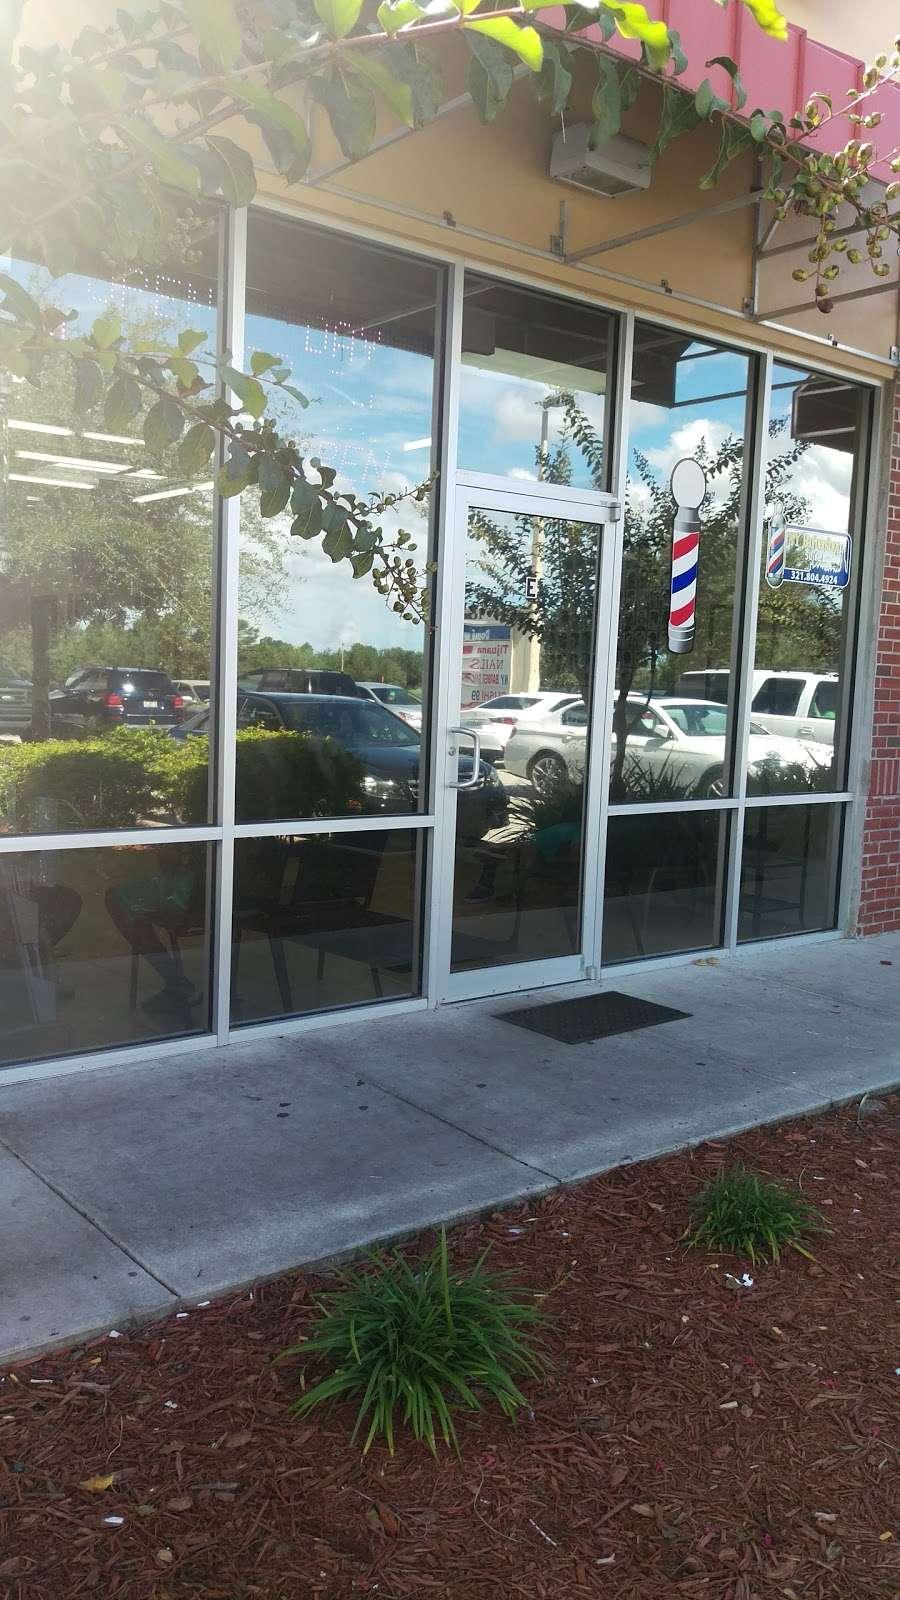 NY Barber Shop - hair care  | Photo 2 of 2 | Address: 1024 Avalon Park North Boulevard, Orlando, FL 32828, USA | Phone: (321) 804-4924